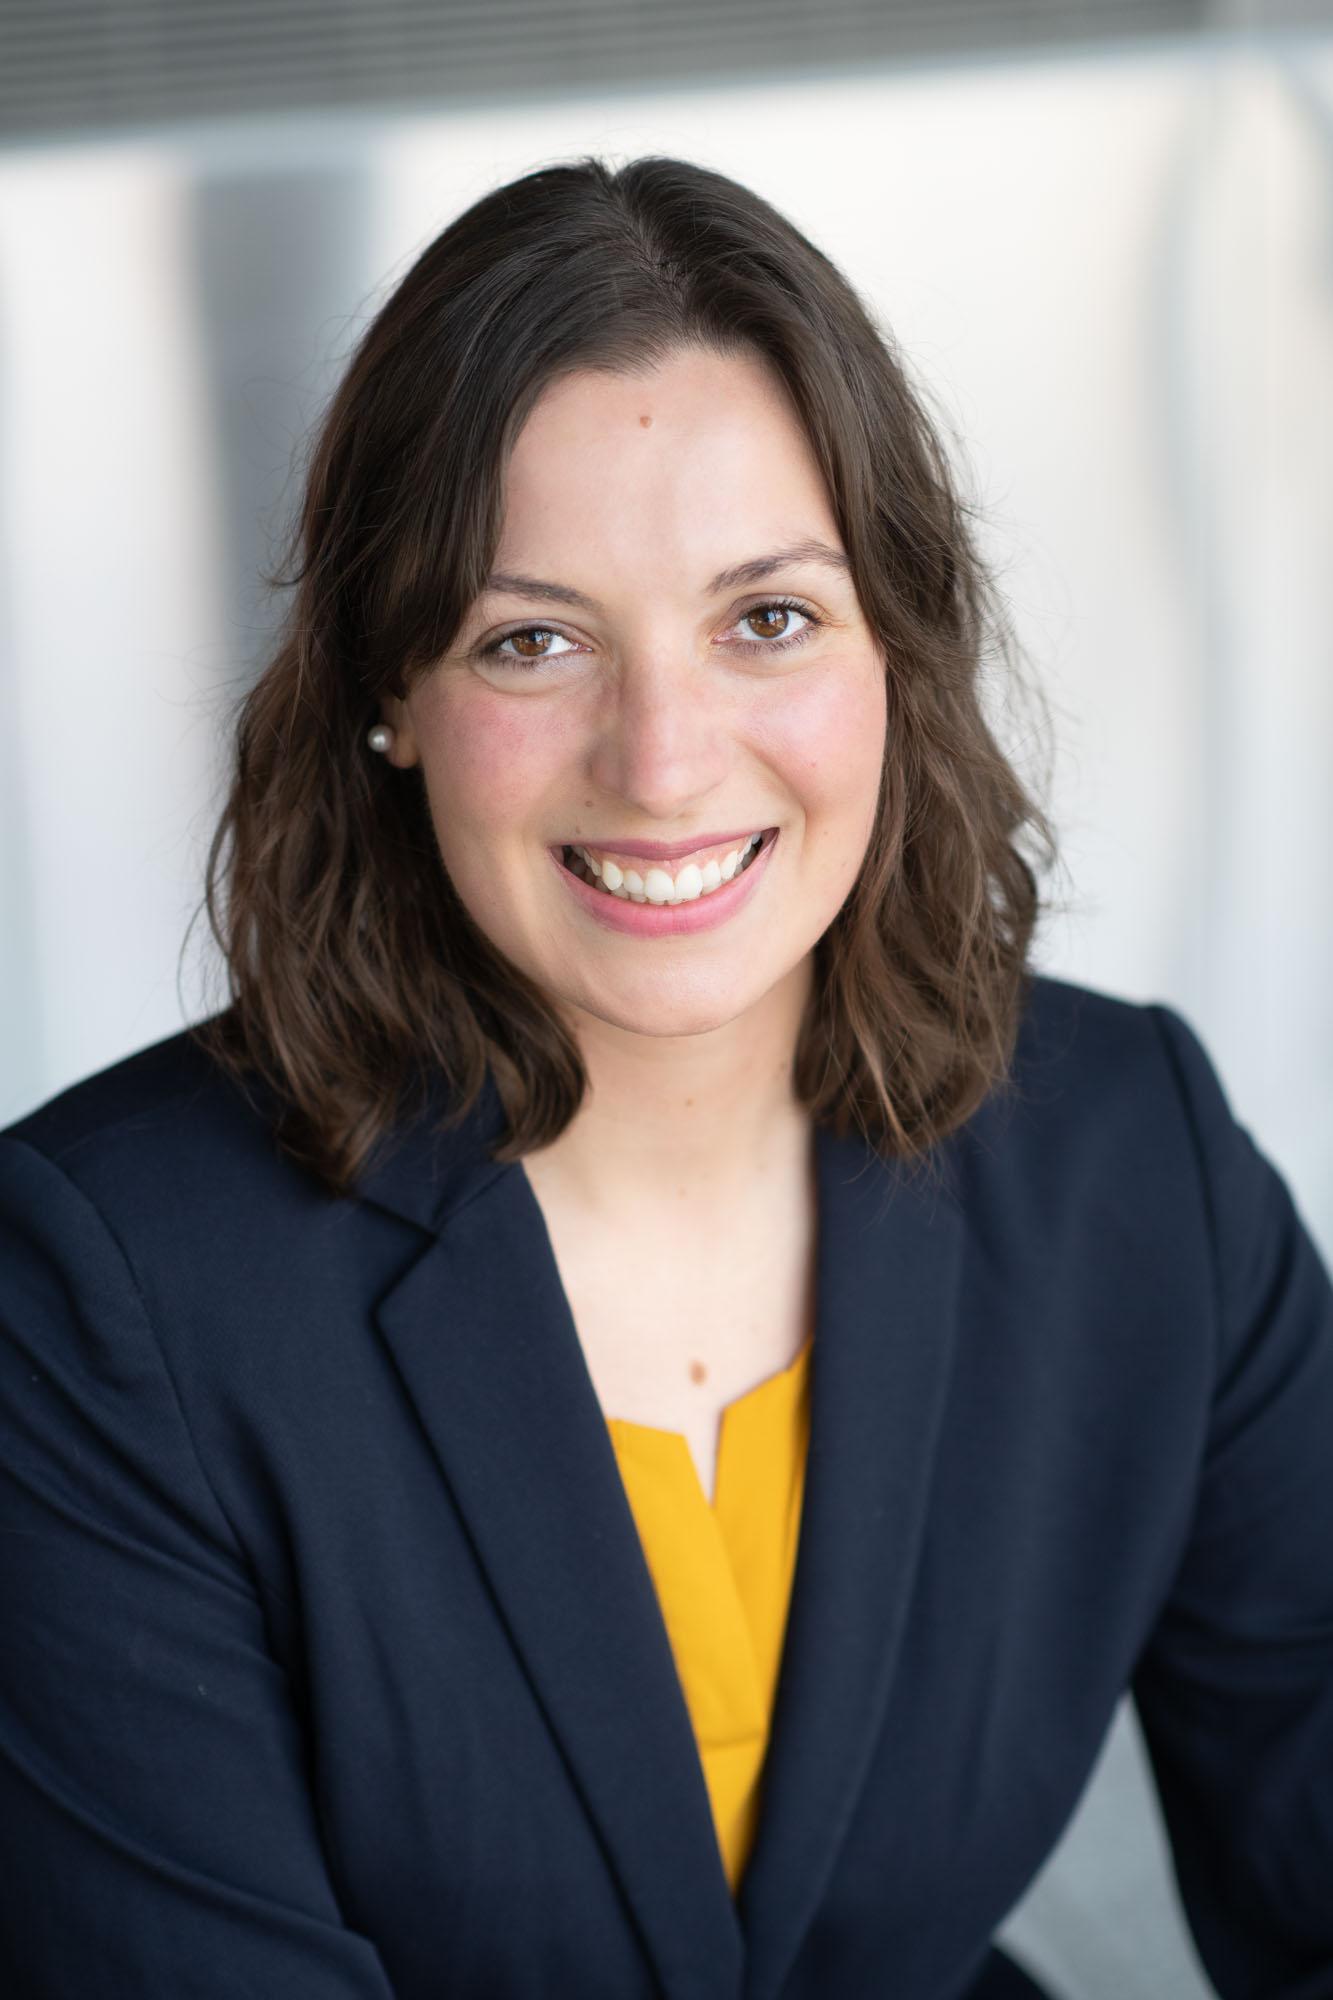 Image of Madeline Turbes, BA, Psychometrist